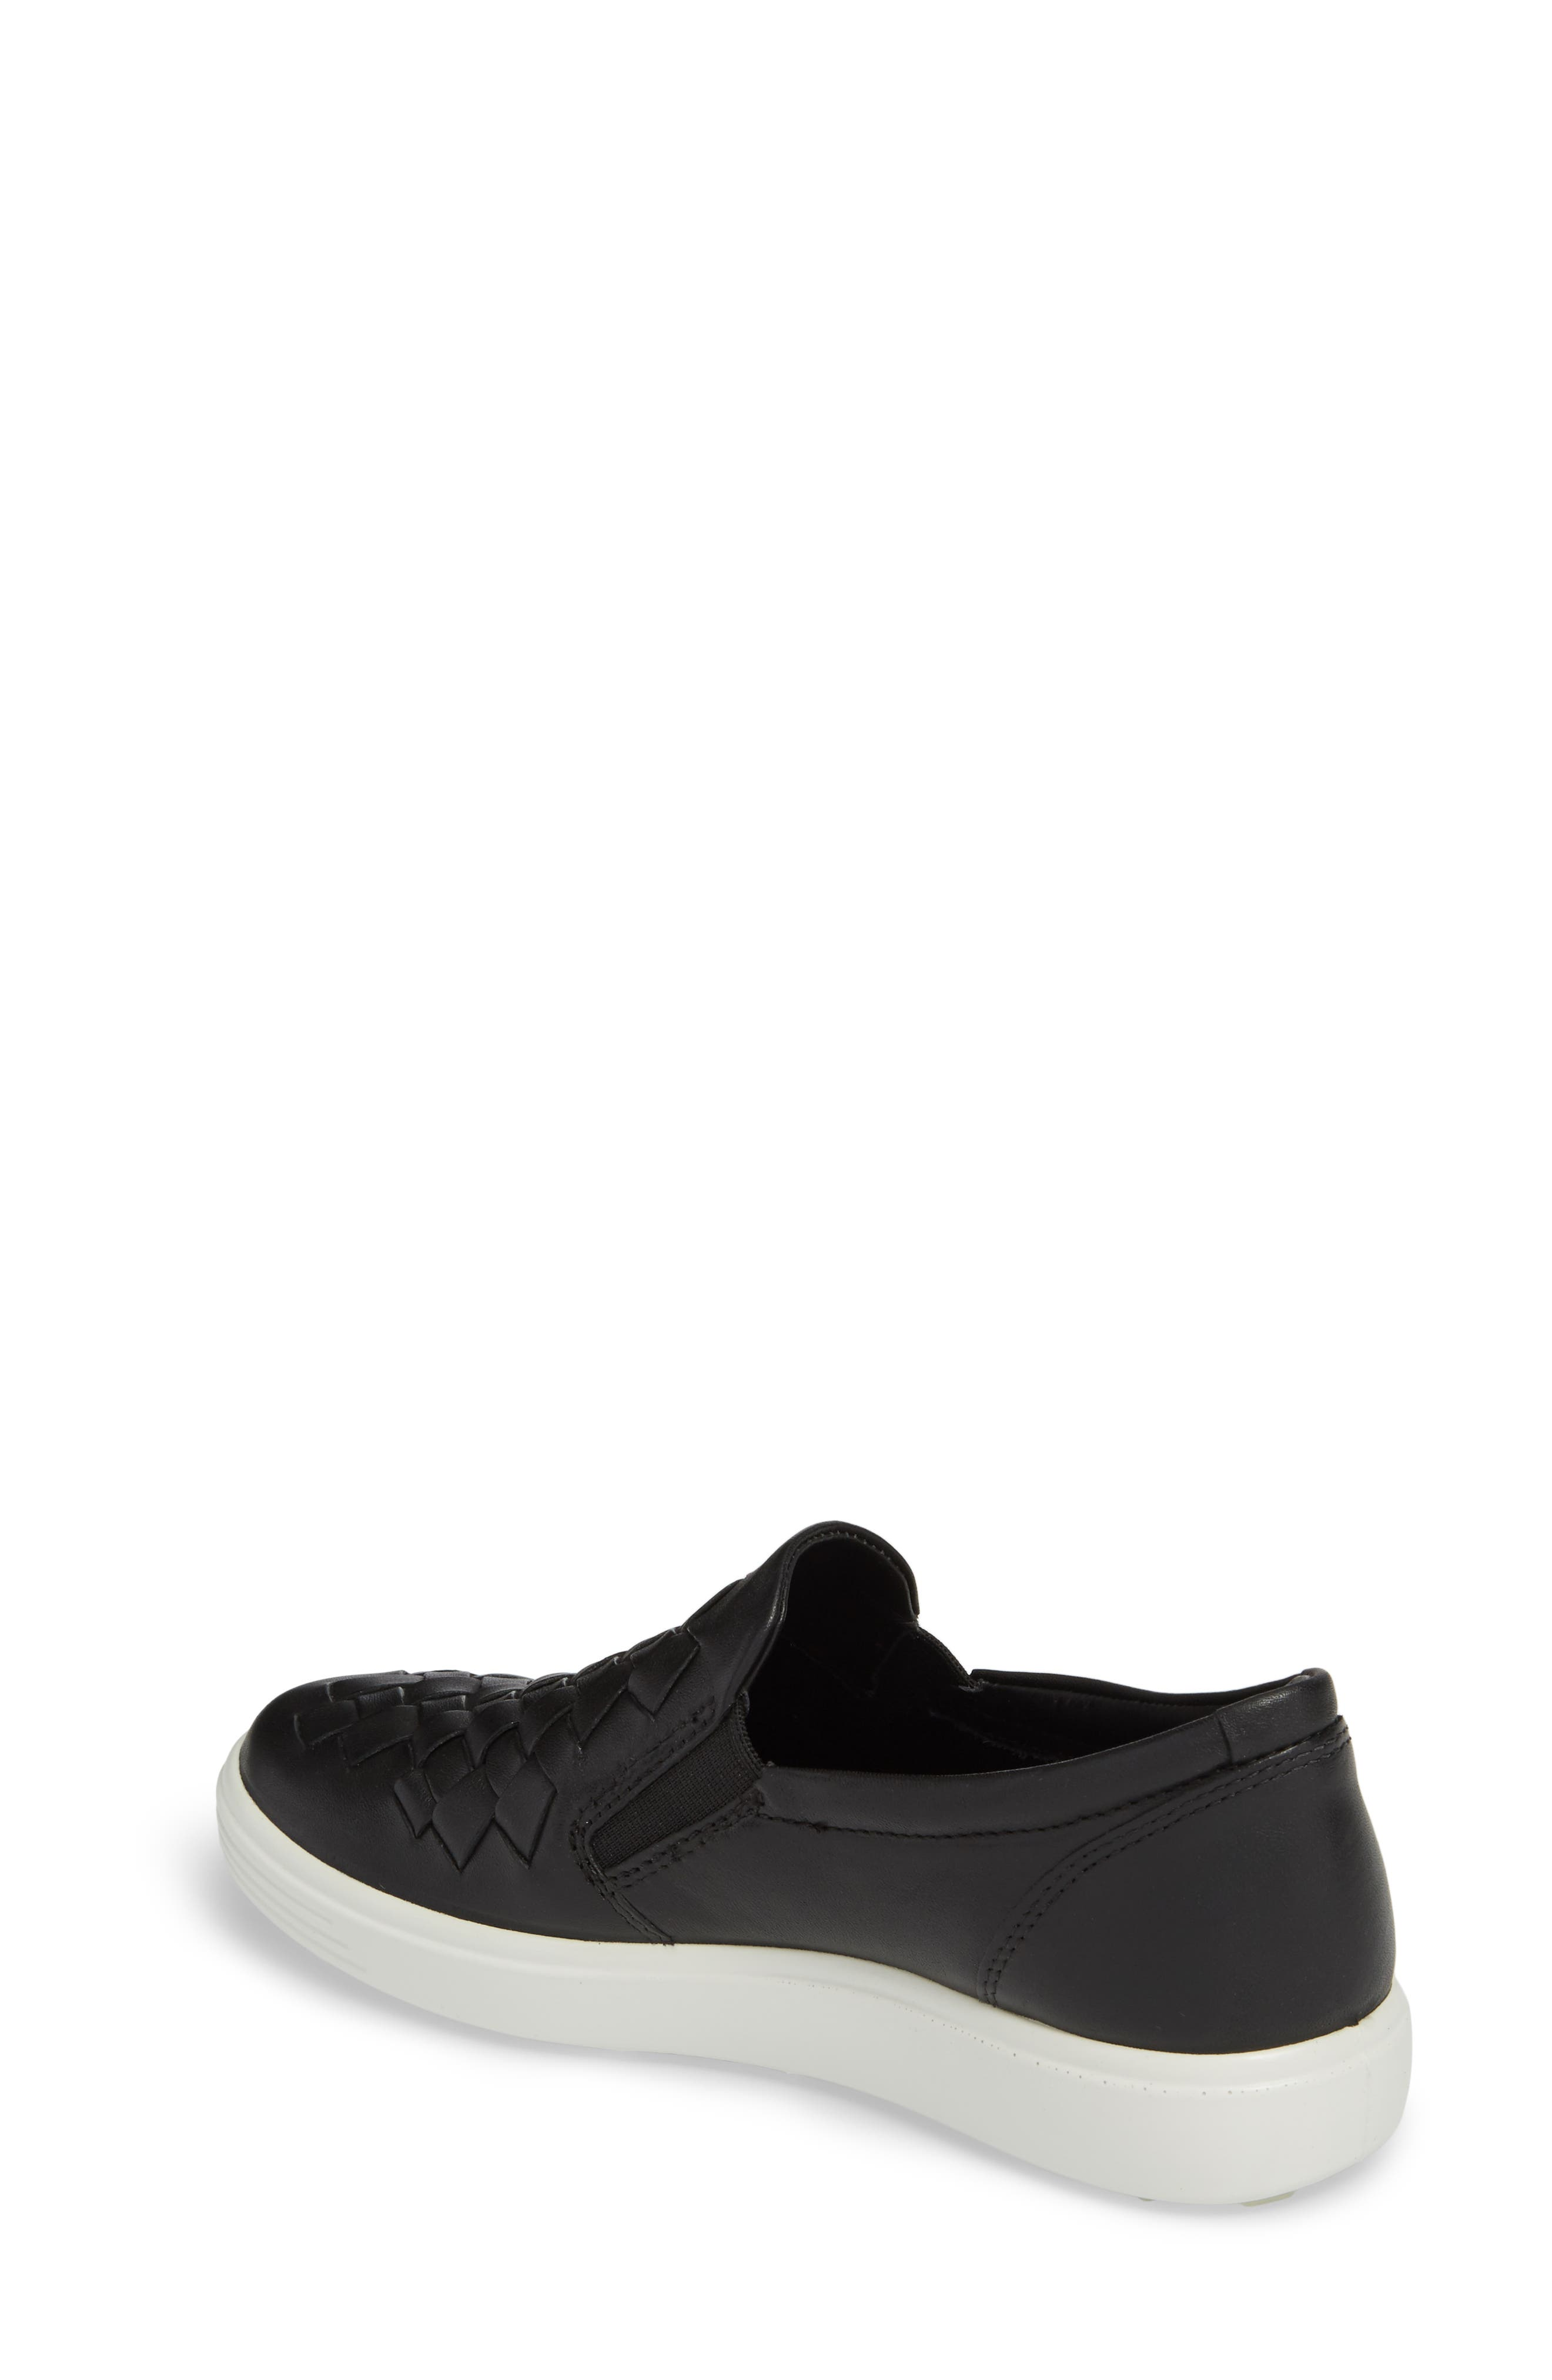 ECO Soft 7 Woven Slip-On Sneaker,                             Alternate thumbnail 2, color,                             Black Leather